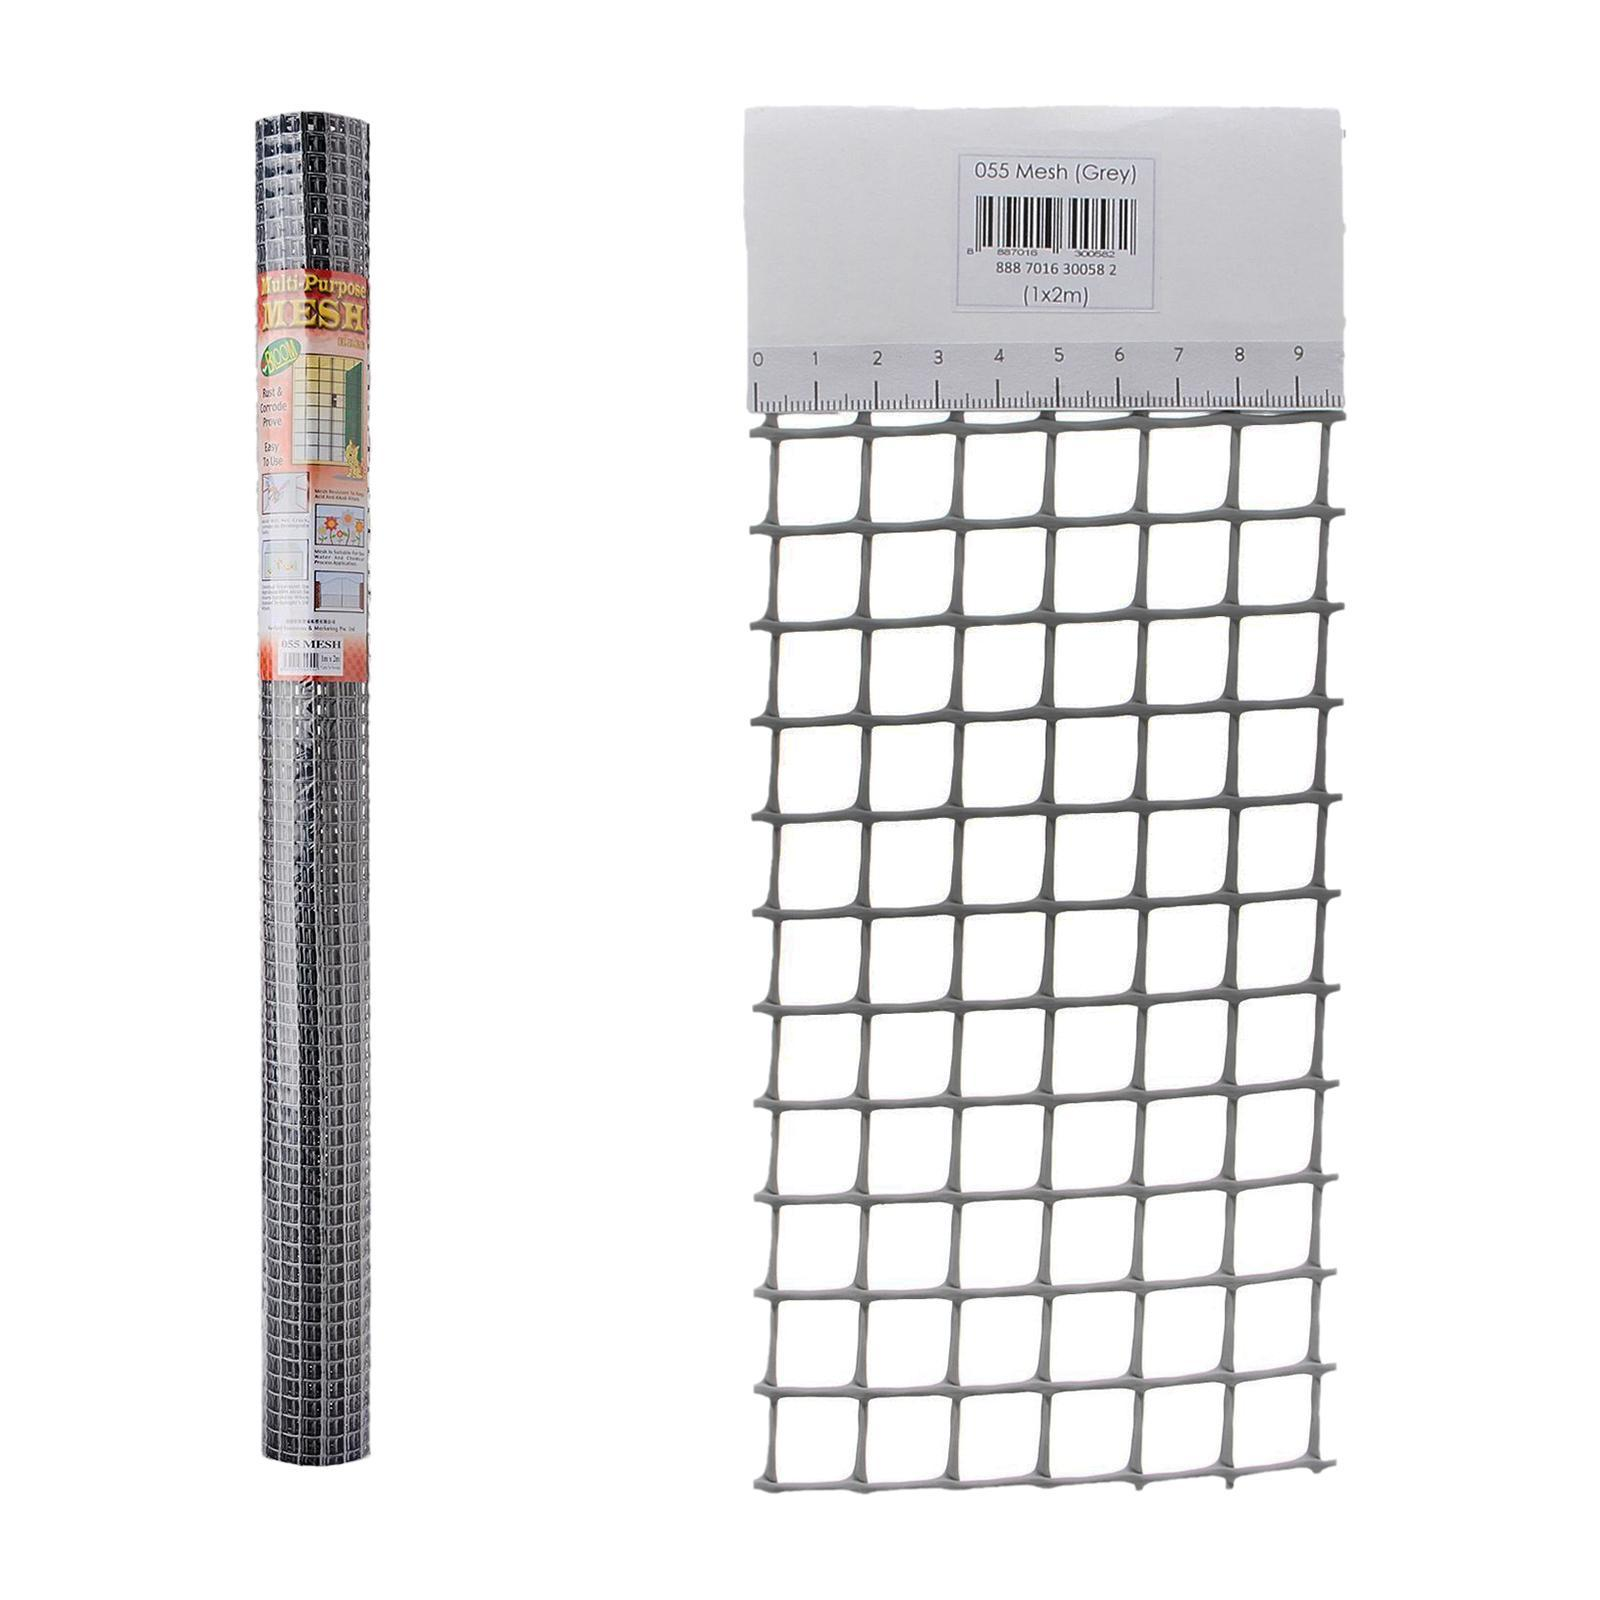 Bloom Multi-Purpose Mesh 2x1m - 14mm (Rectangular)(Grey)